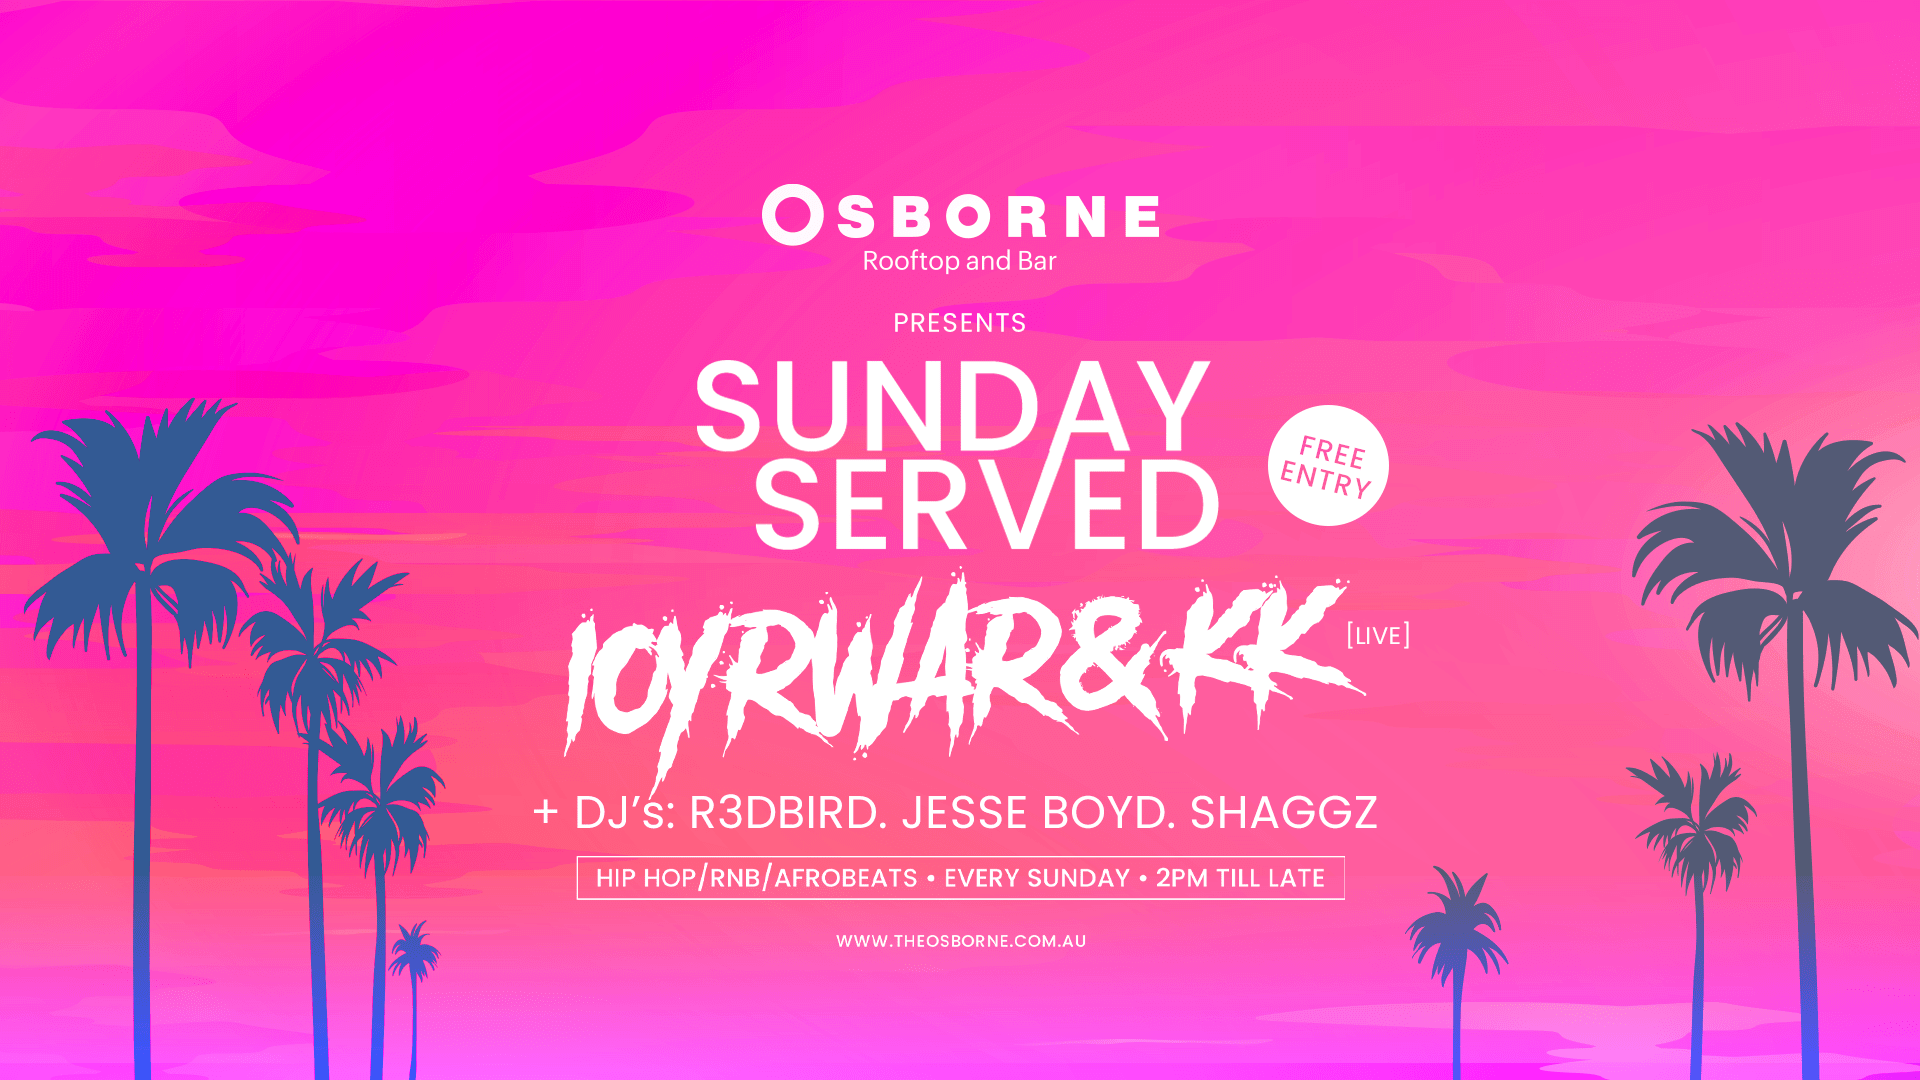 Sunday Served - Osborne Rooftop